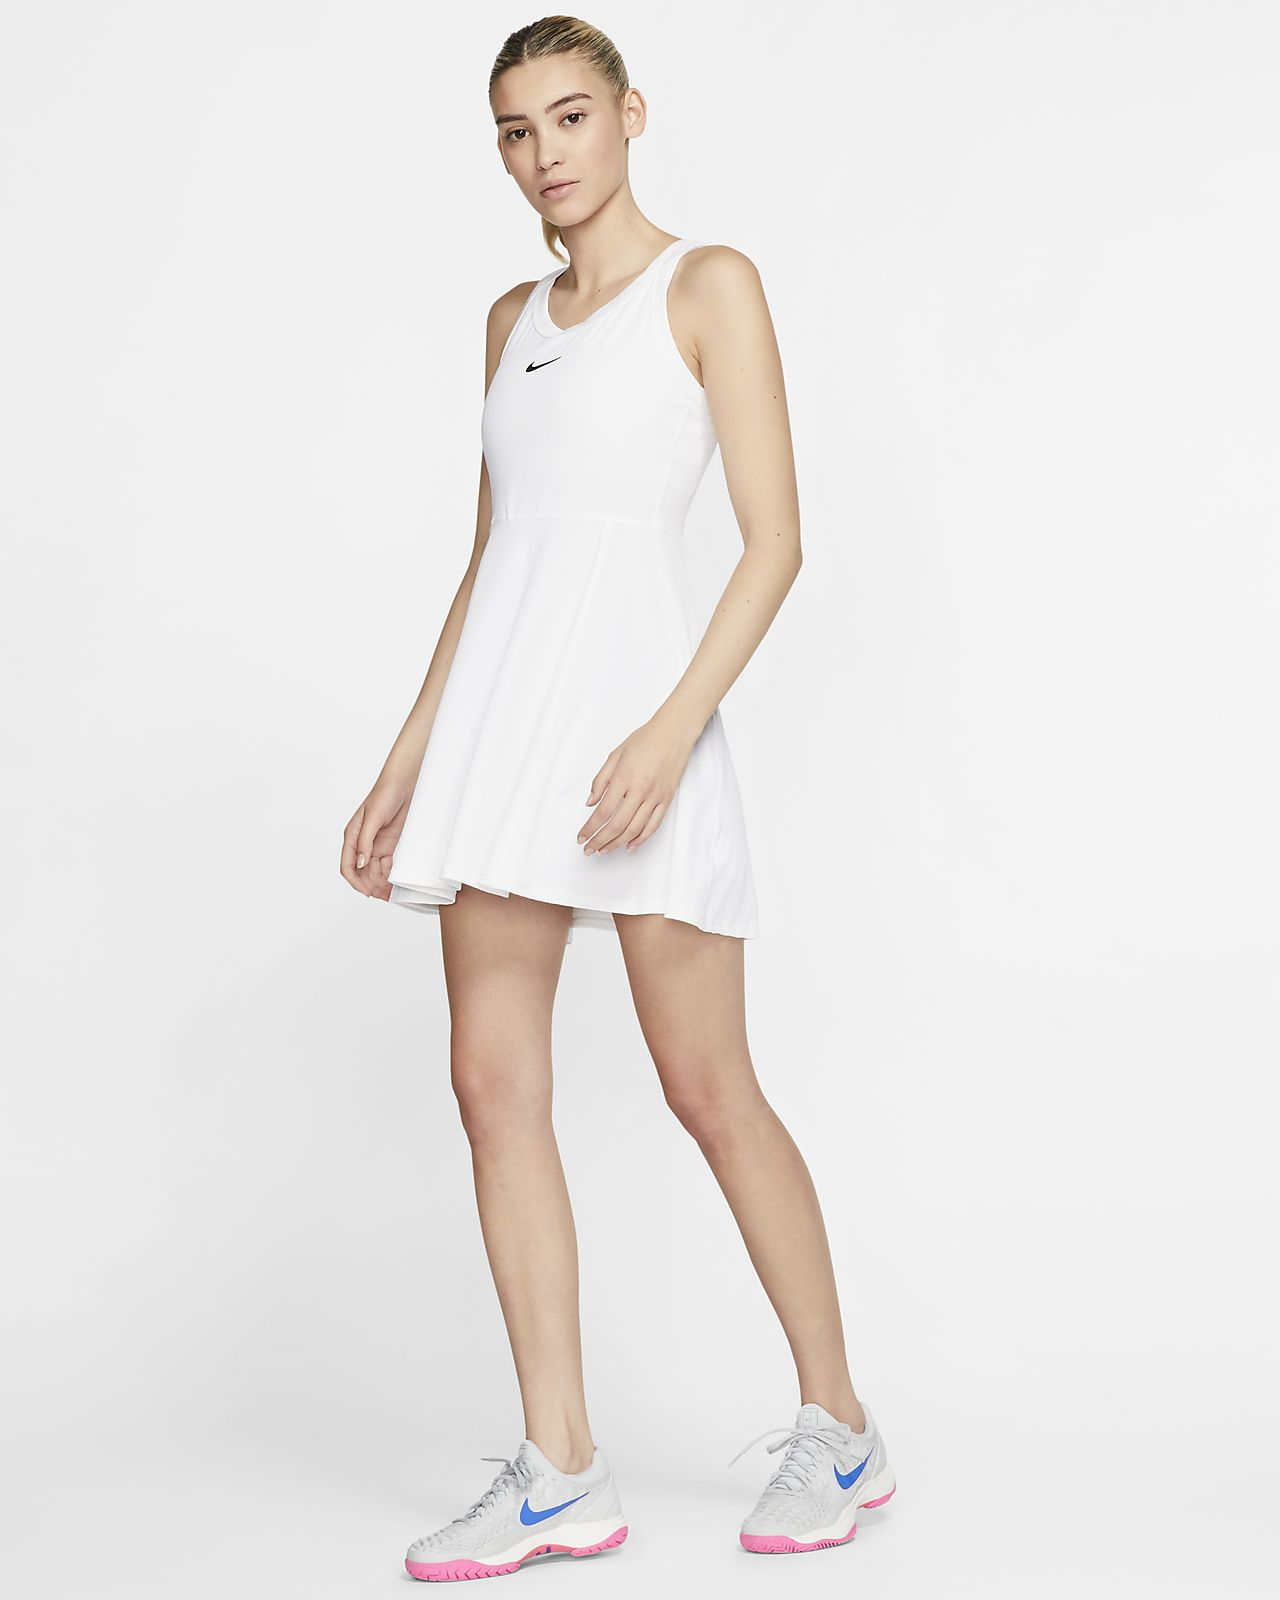 Vestito Nike Court donna Tennis Warehouse Europe